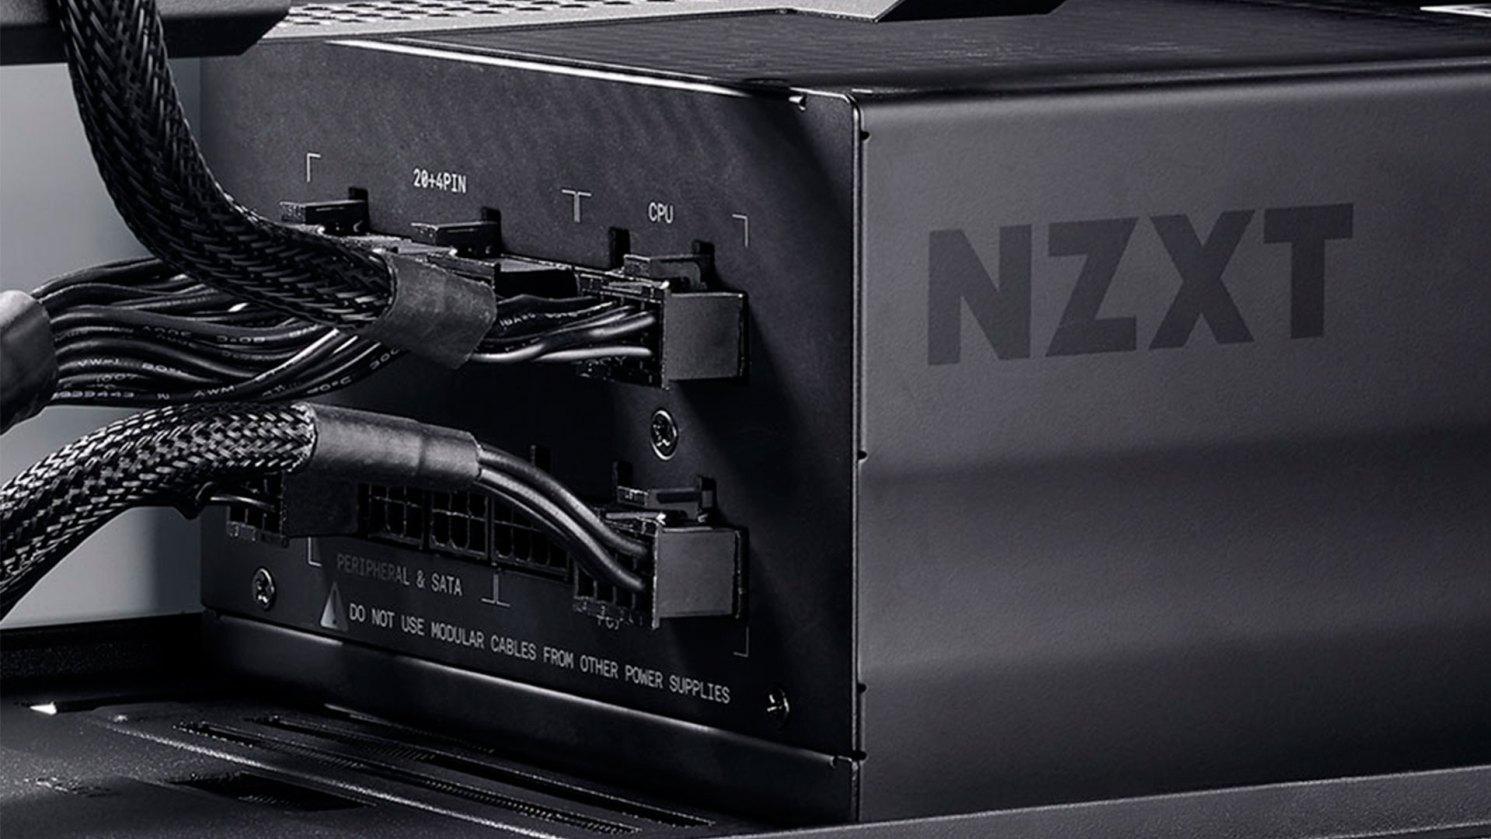 NZXT Serie E 1